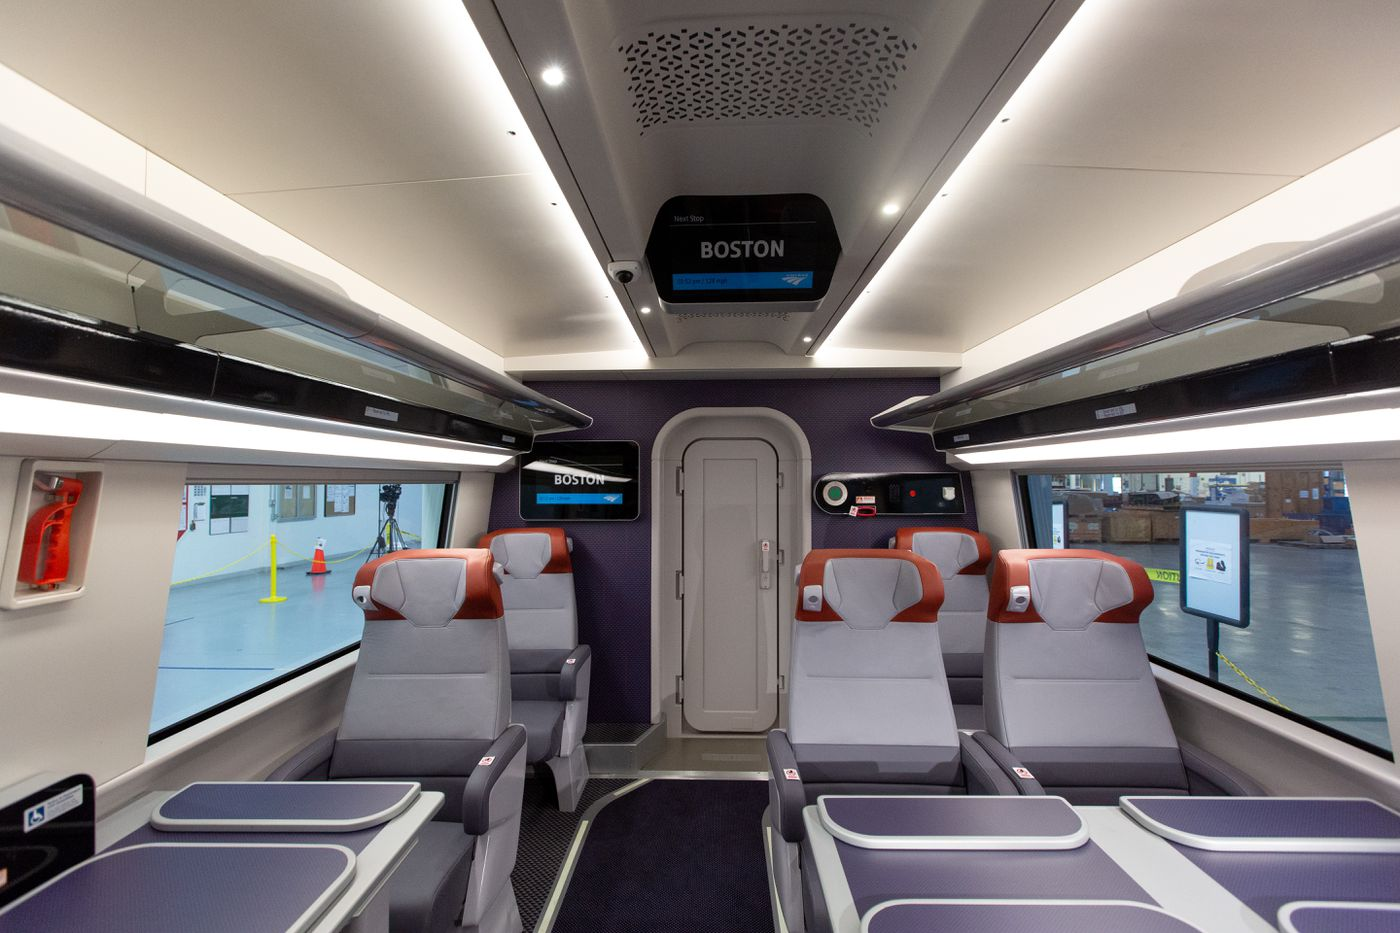 Take a peek at Amtrak's posh new Acela cars